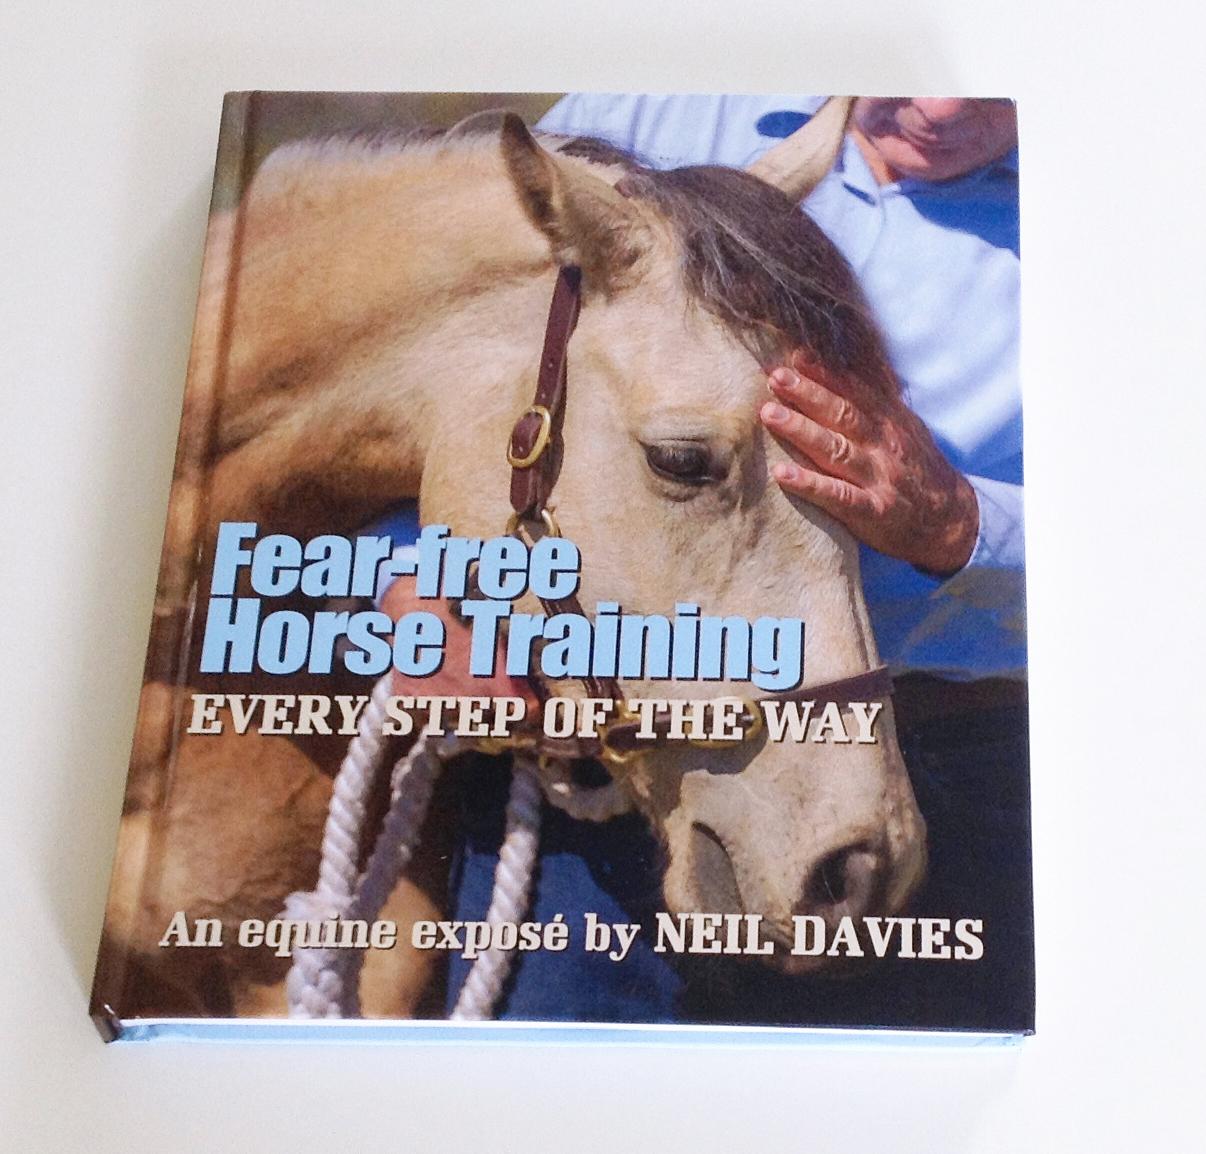 FF horse training cover.jpg